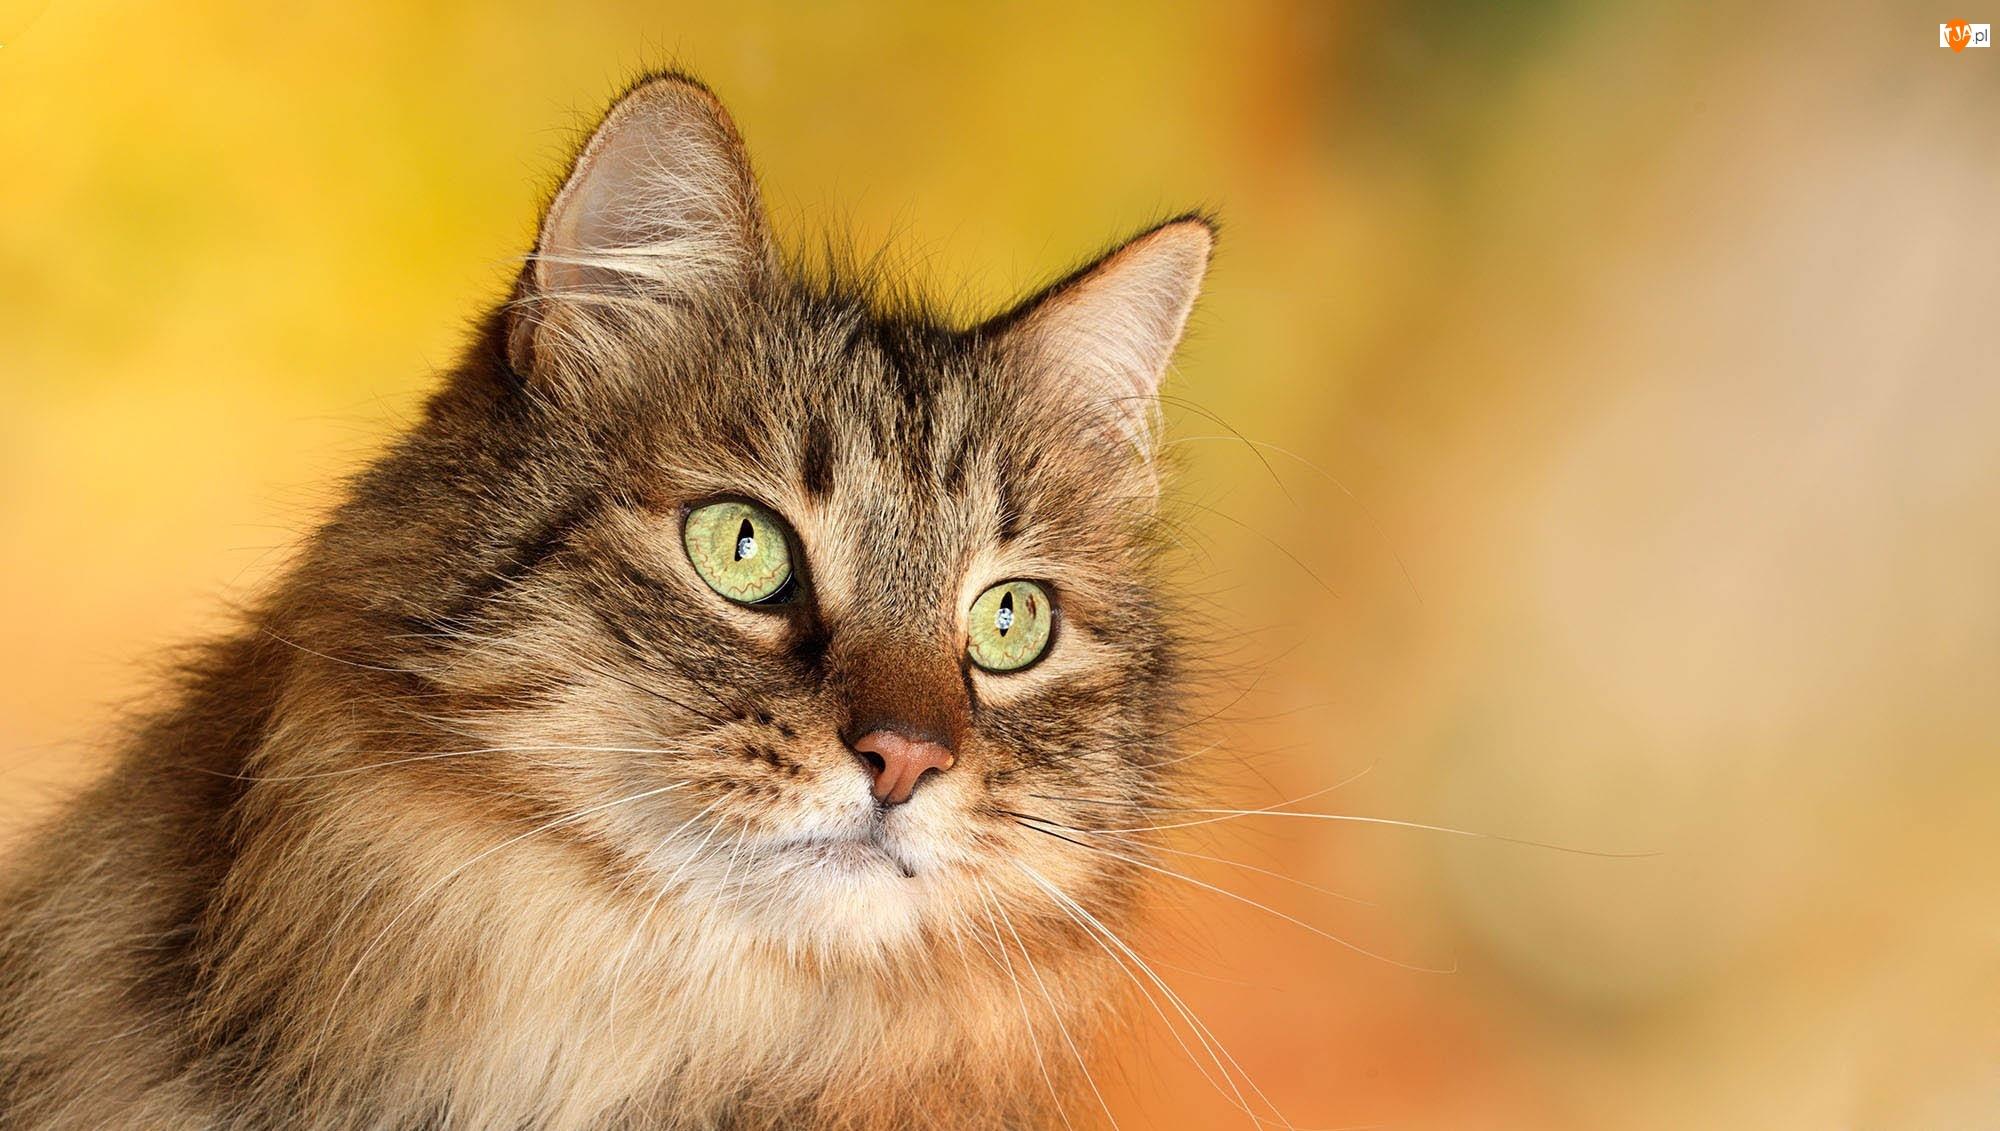 Oczy, Kot, Zielone